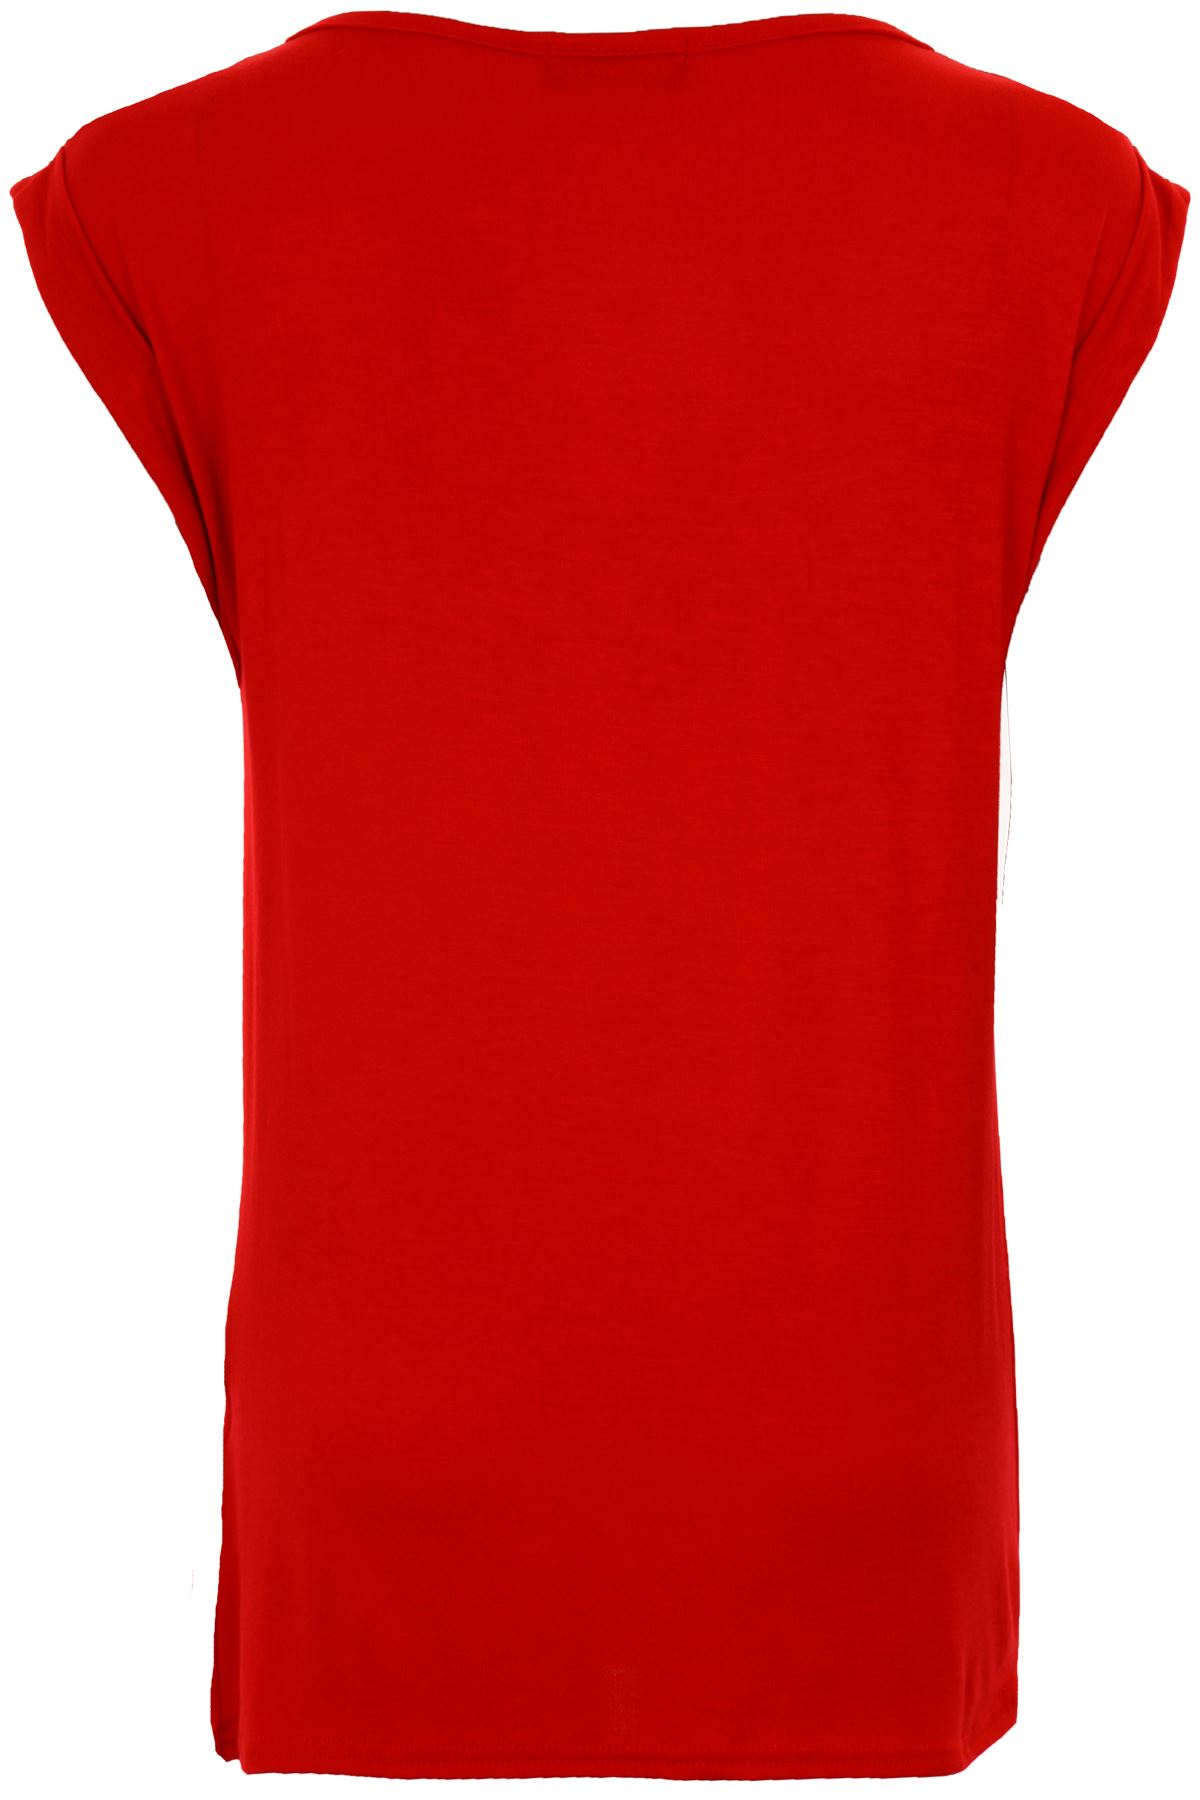 Ladies Olaf Frozen Minion Merry Christmas XMAS Festive Women's Top T-Shirt